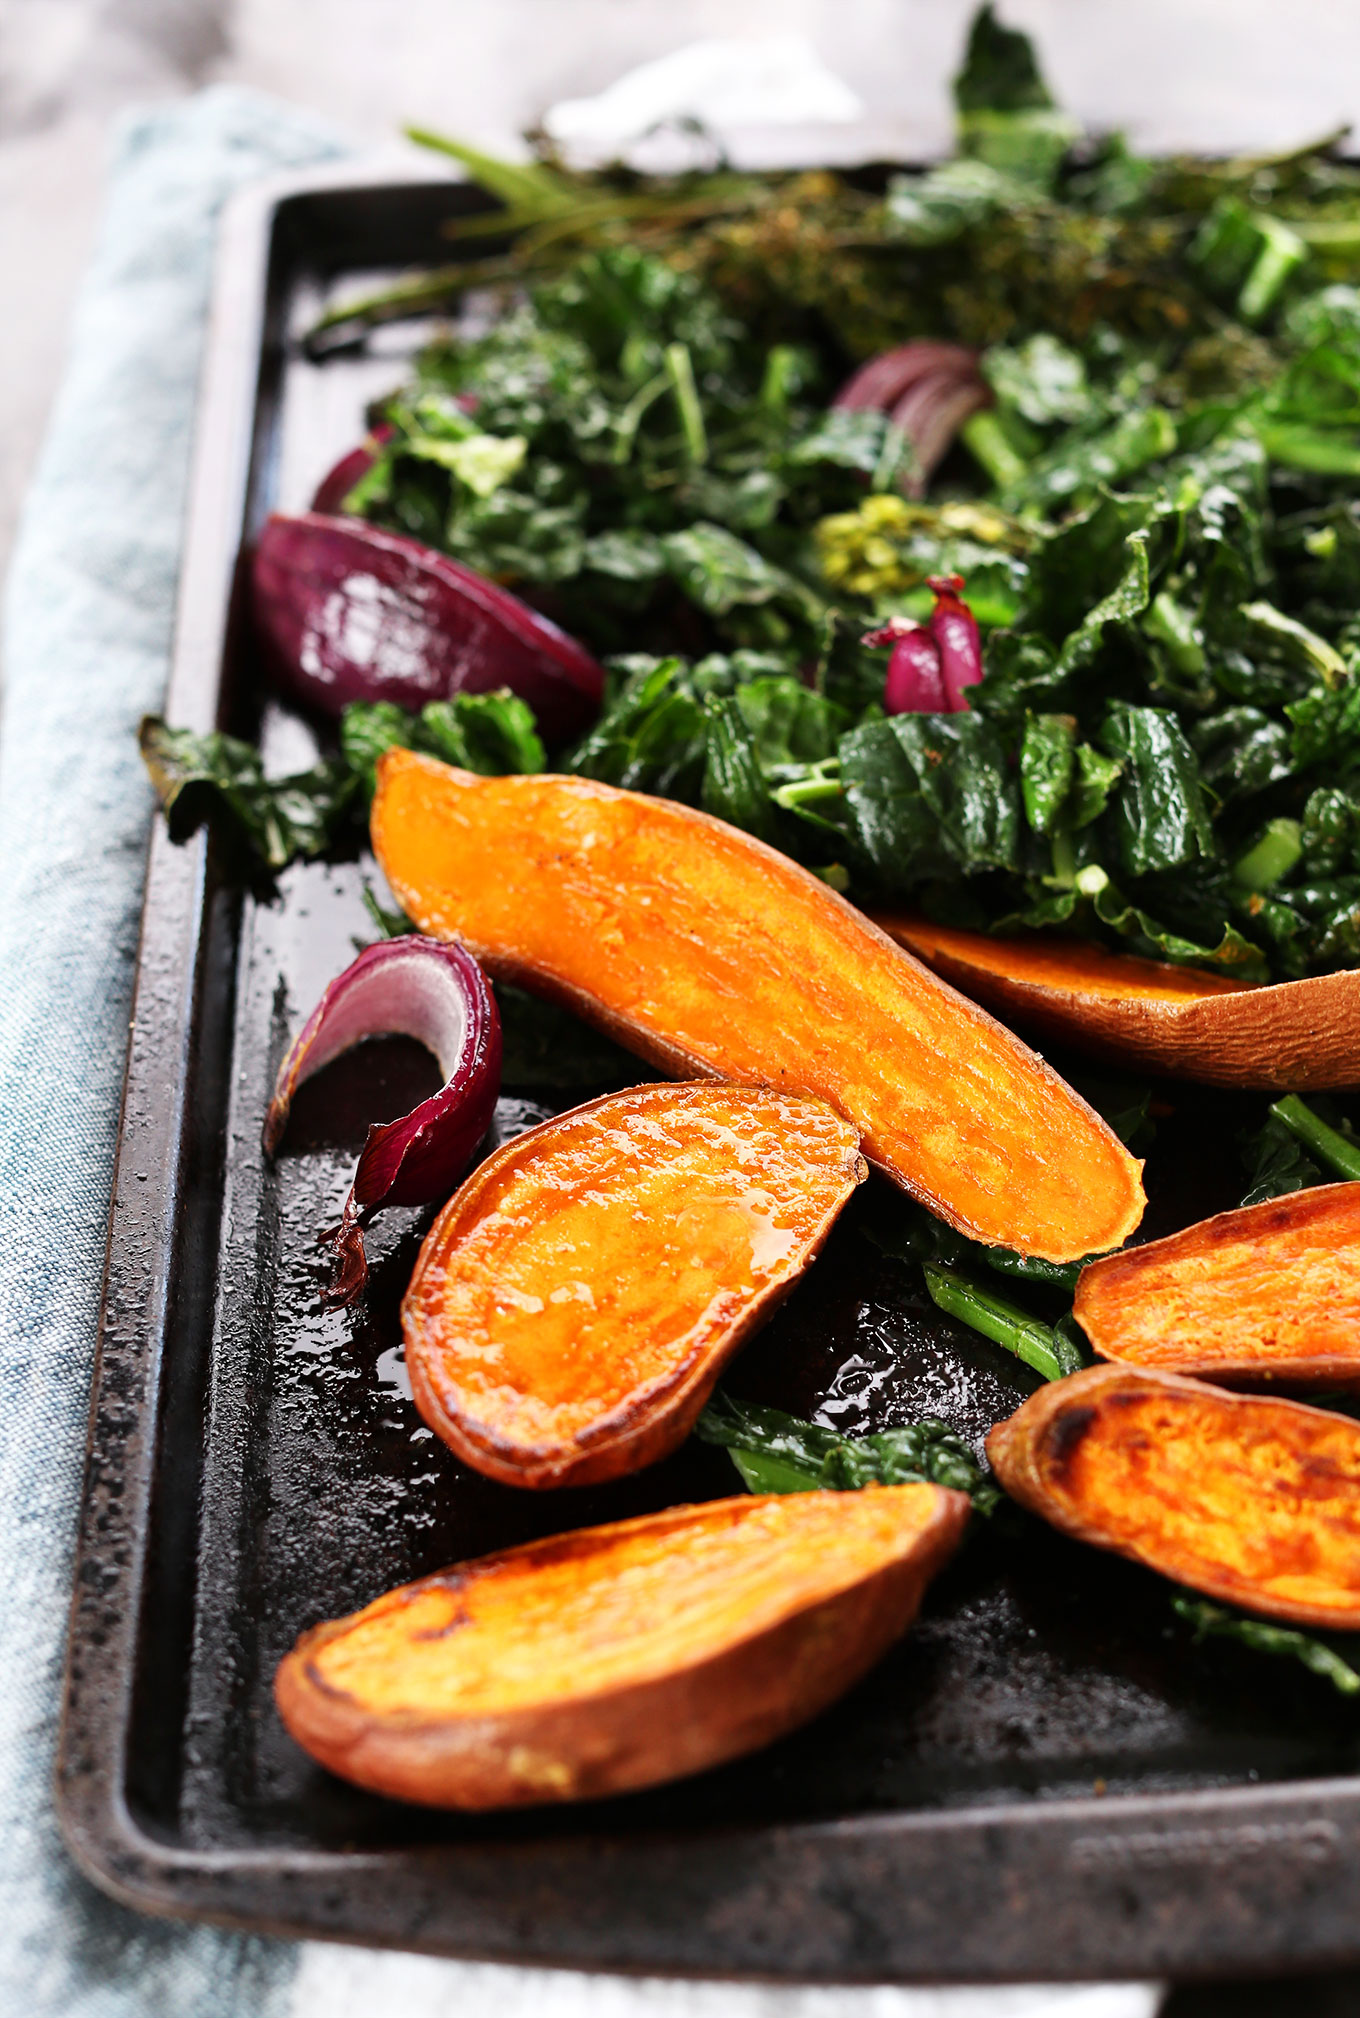 Baking sheet with sweet potatoes and greens for making vegan Buddha Bowls